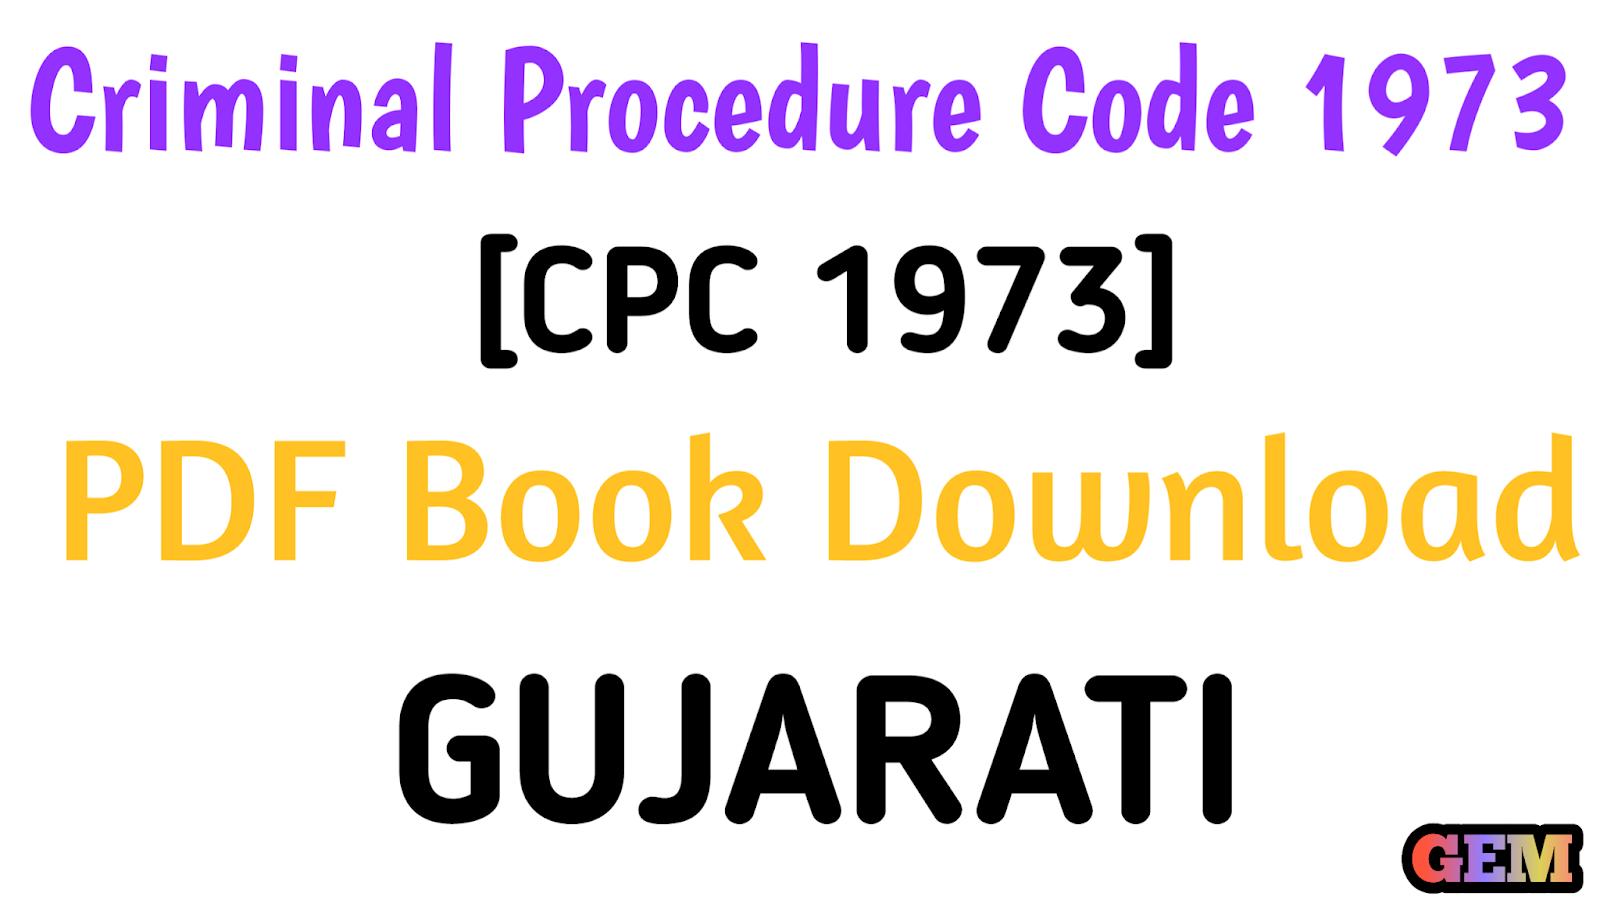 Criminal Procedure Code 1973 [CPC 1973] PDF Book Download in